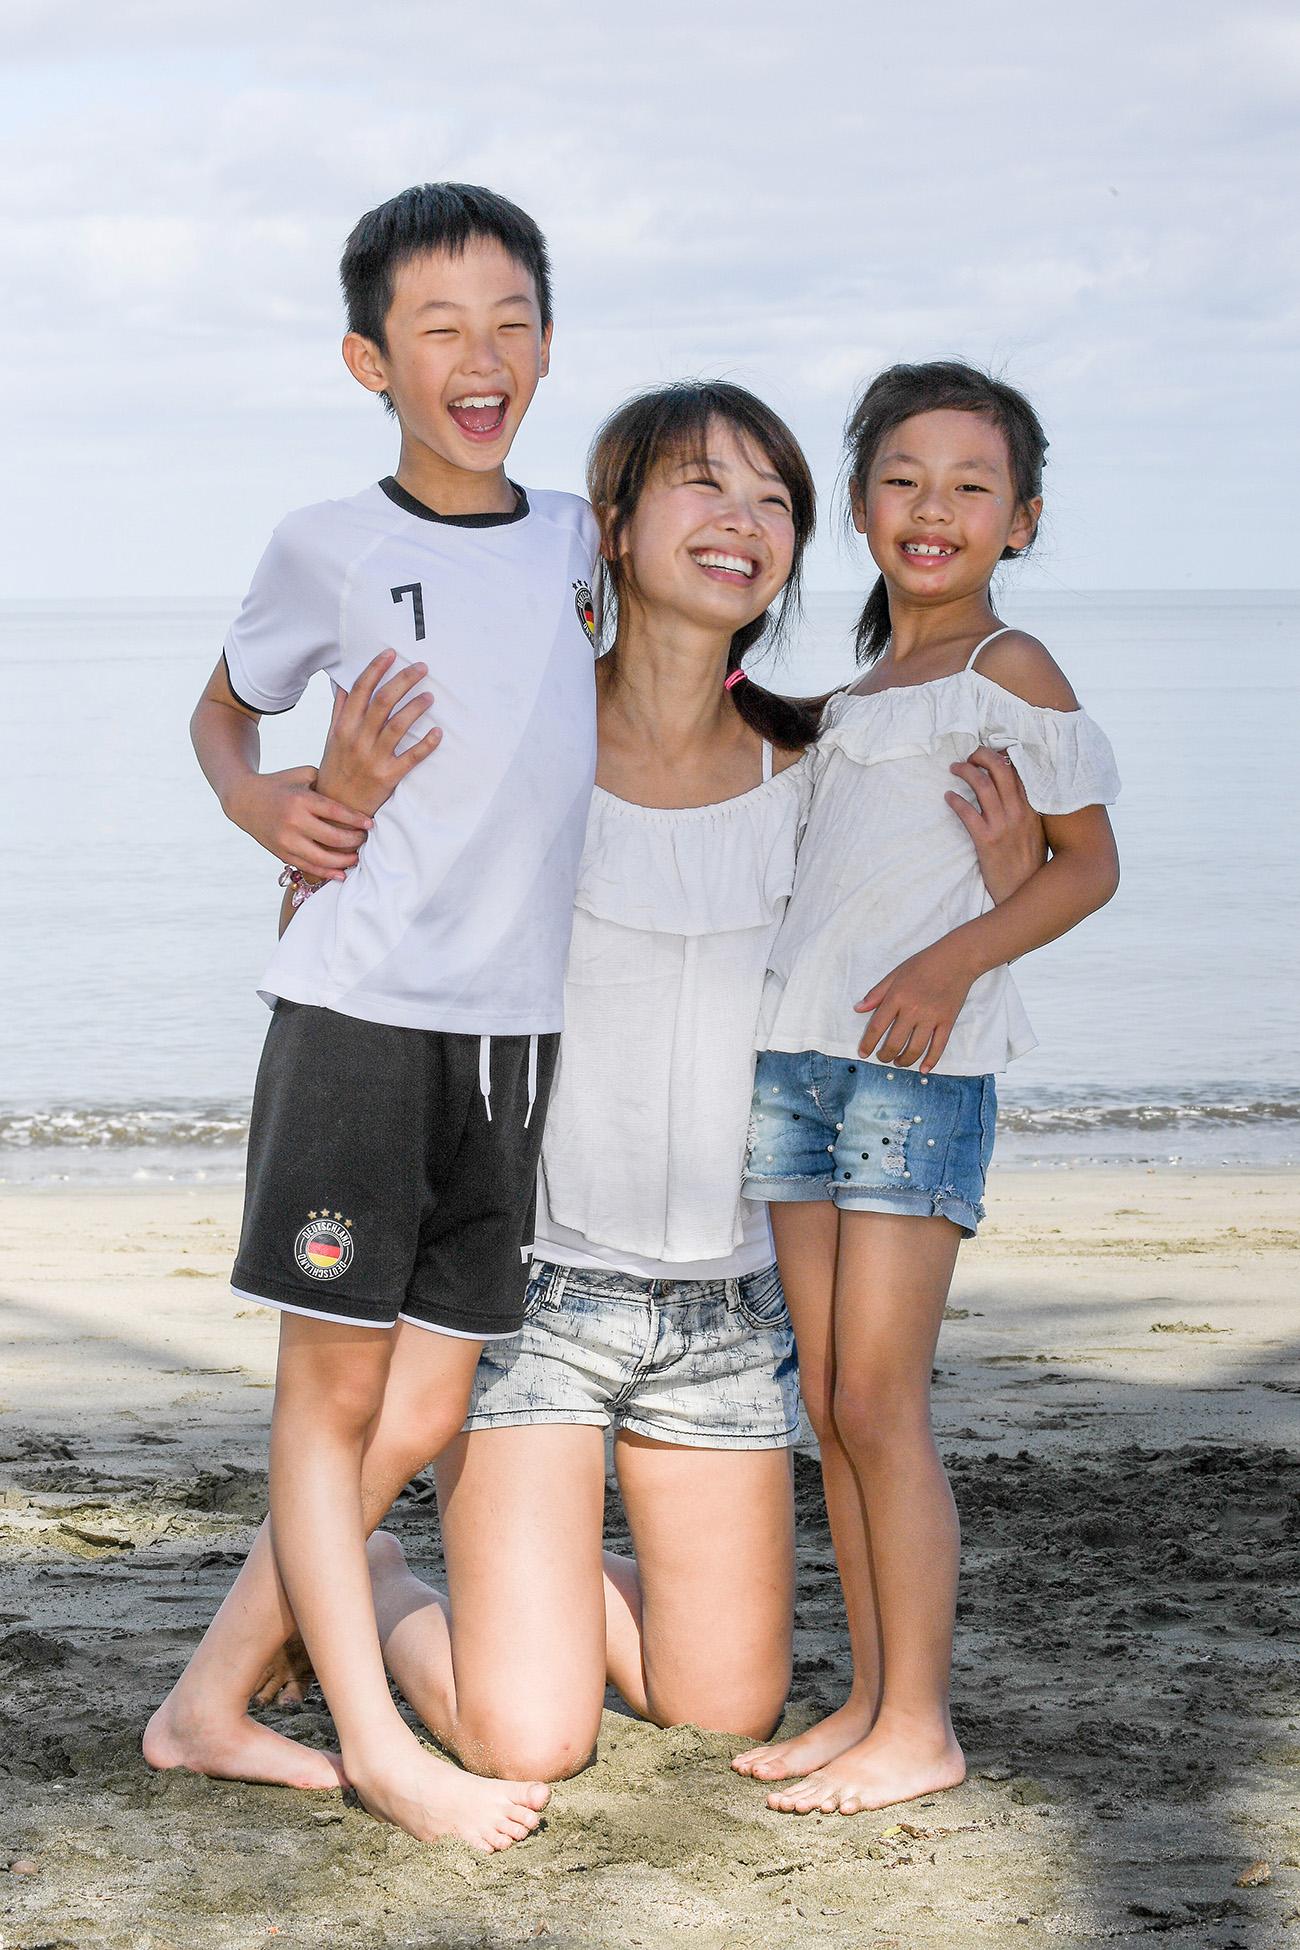 Cute asian family pose on the beach